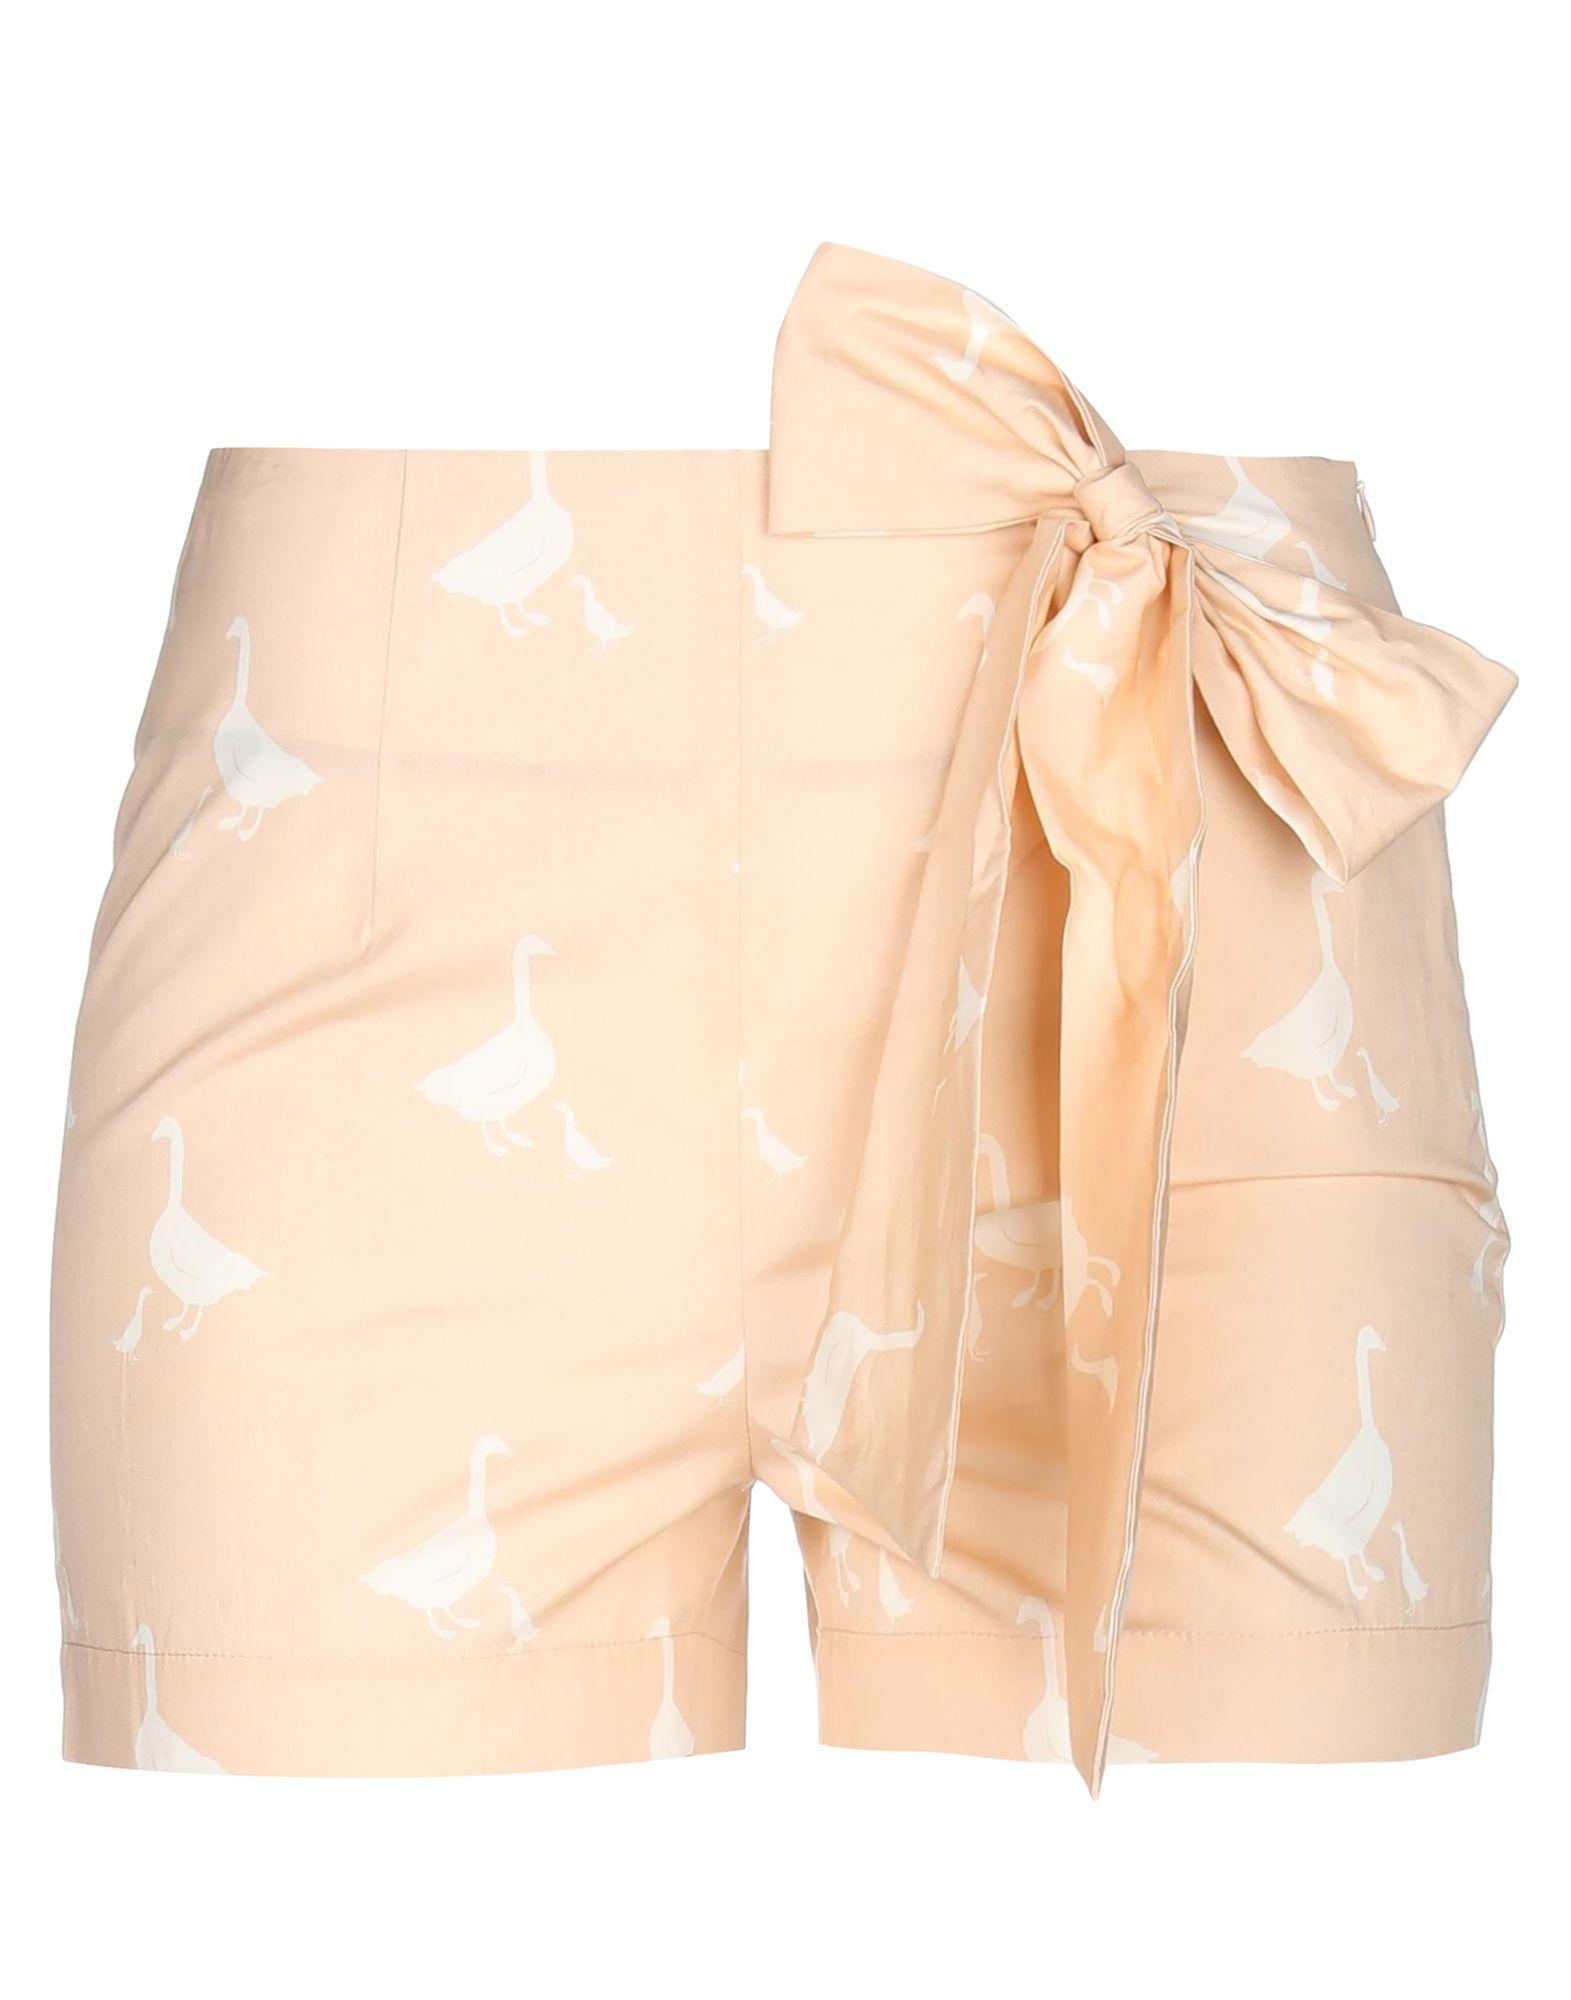 L' AUTRE CHOSE Повседневные шорты l autre chose soleil пляжные брюки и шорты page 5